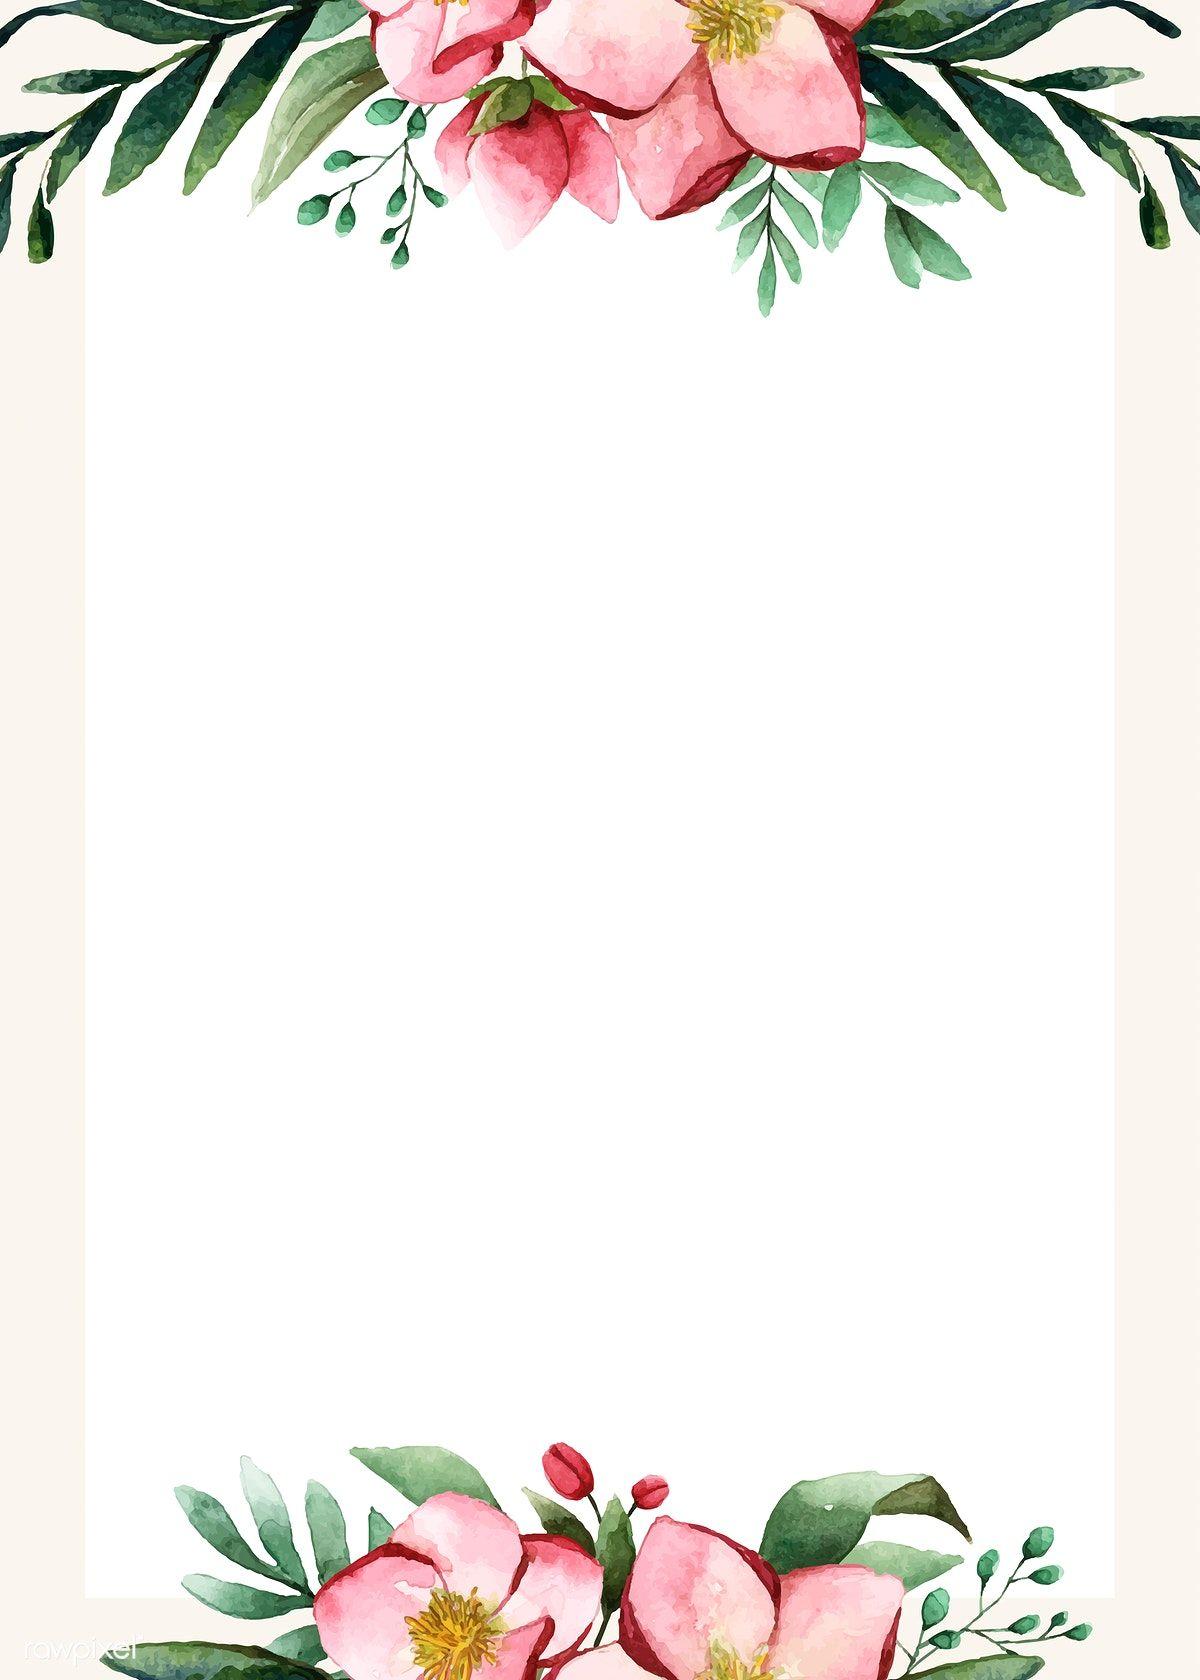 Download premium vector of Flowers invitation card